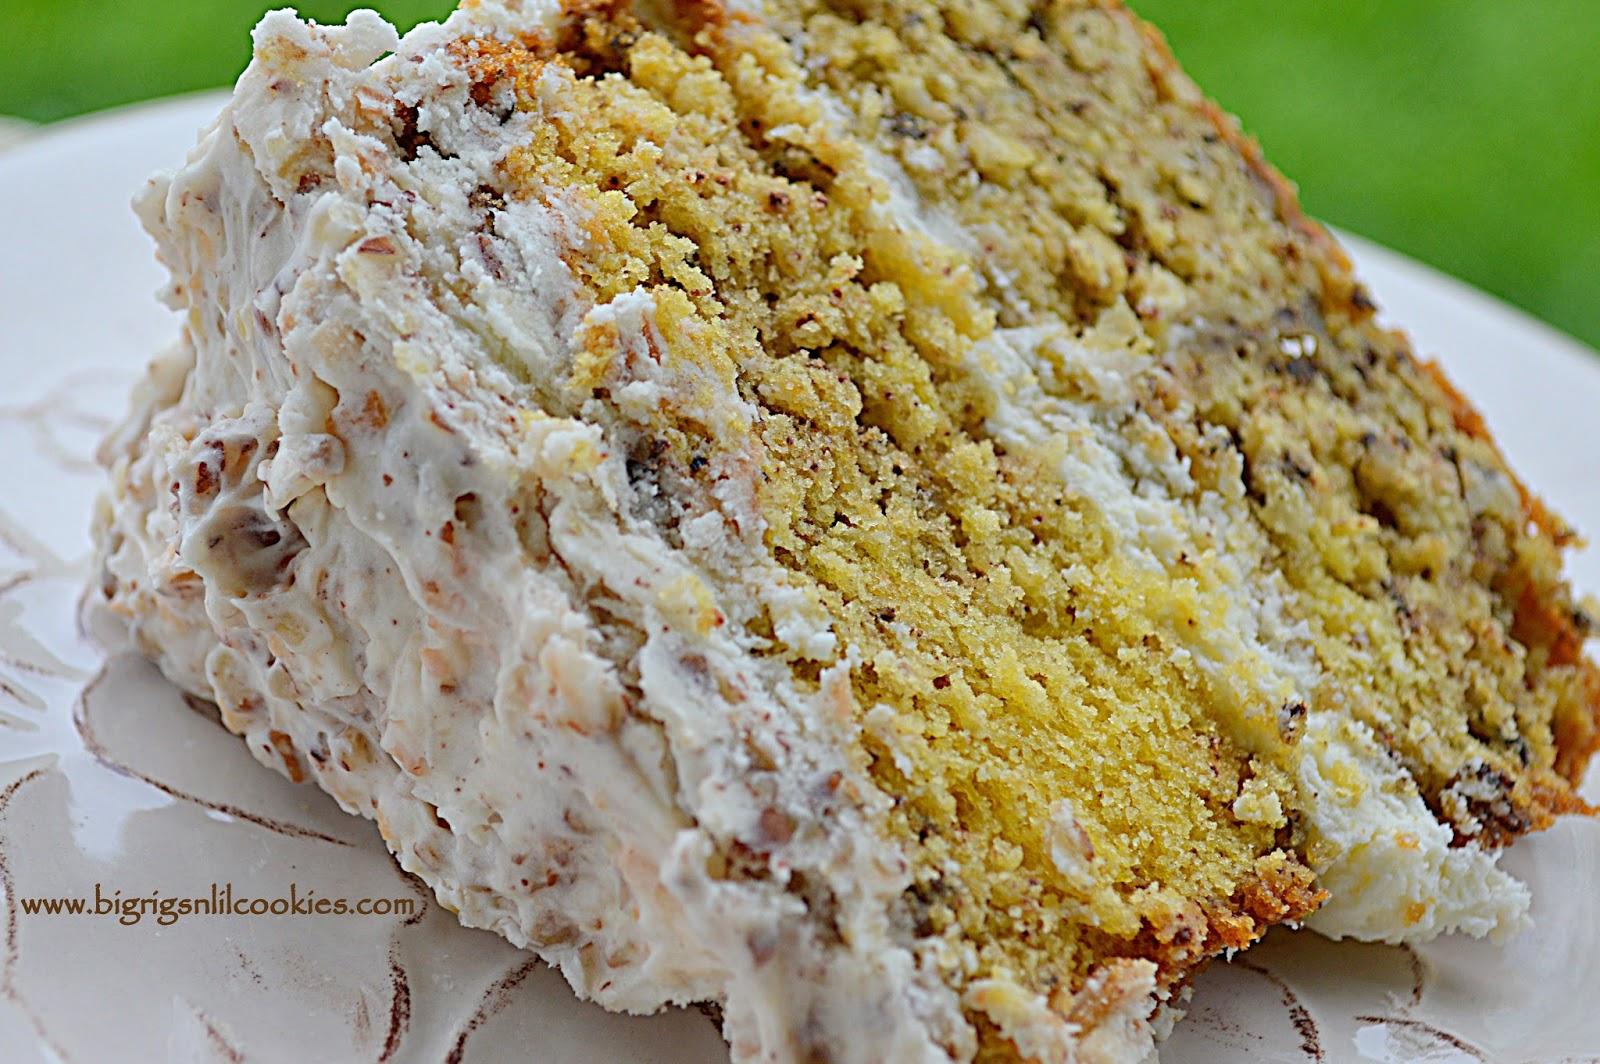 Big Rigs n Lil Cookies Italian Cream Cake